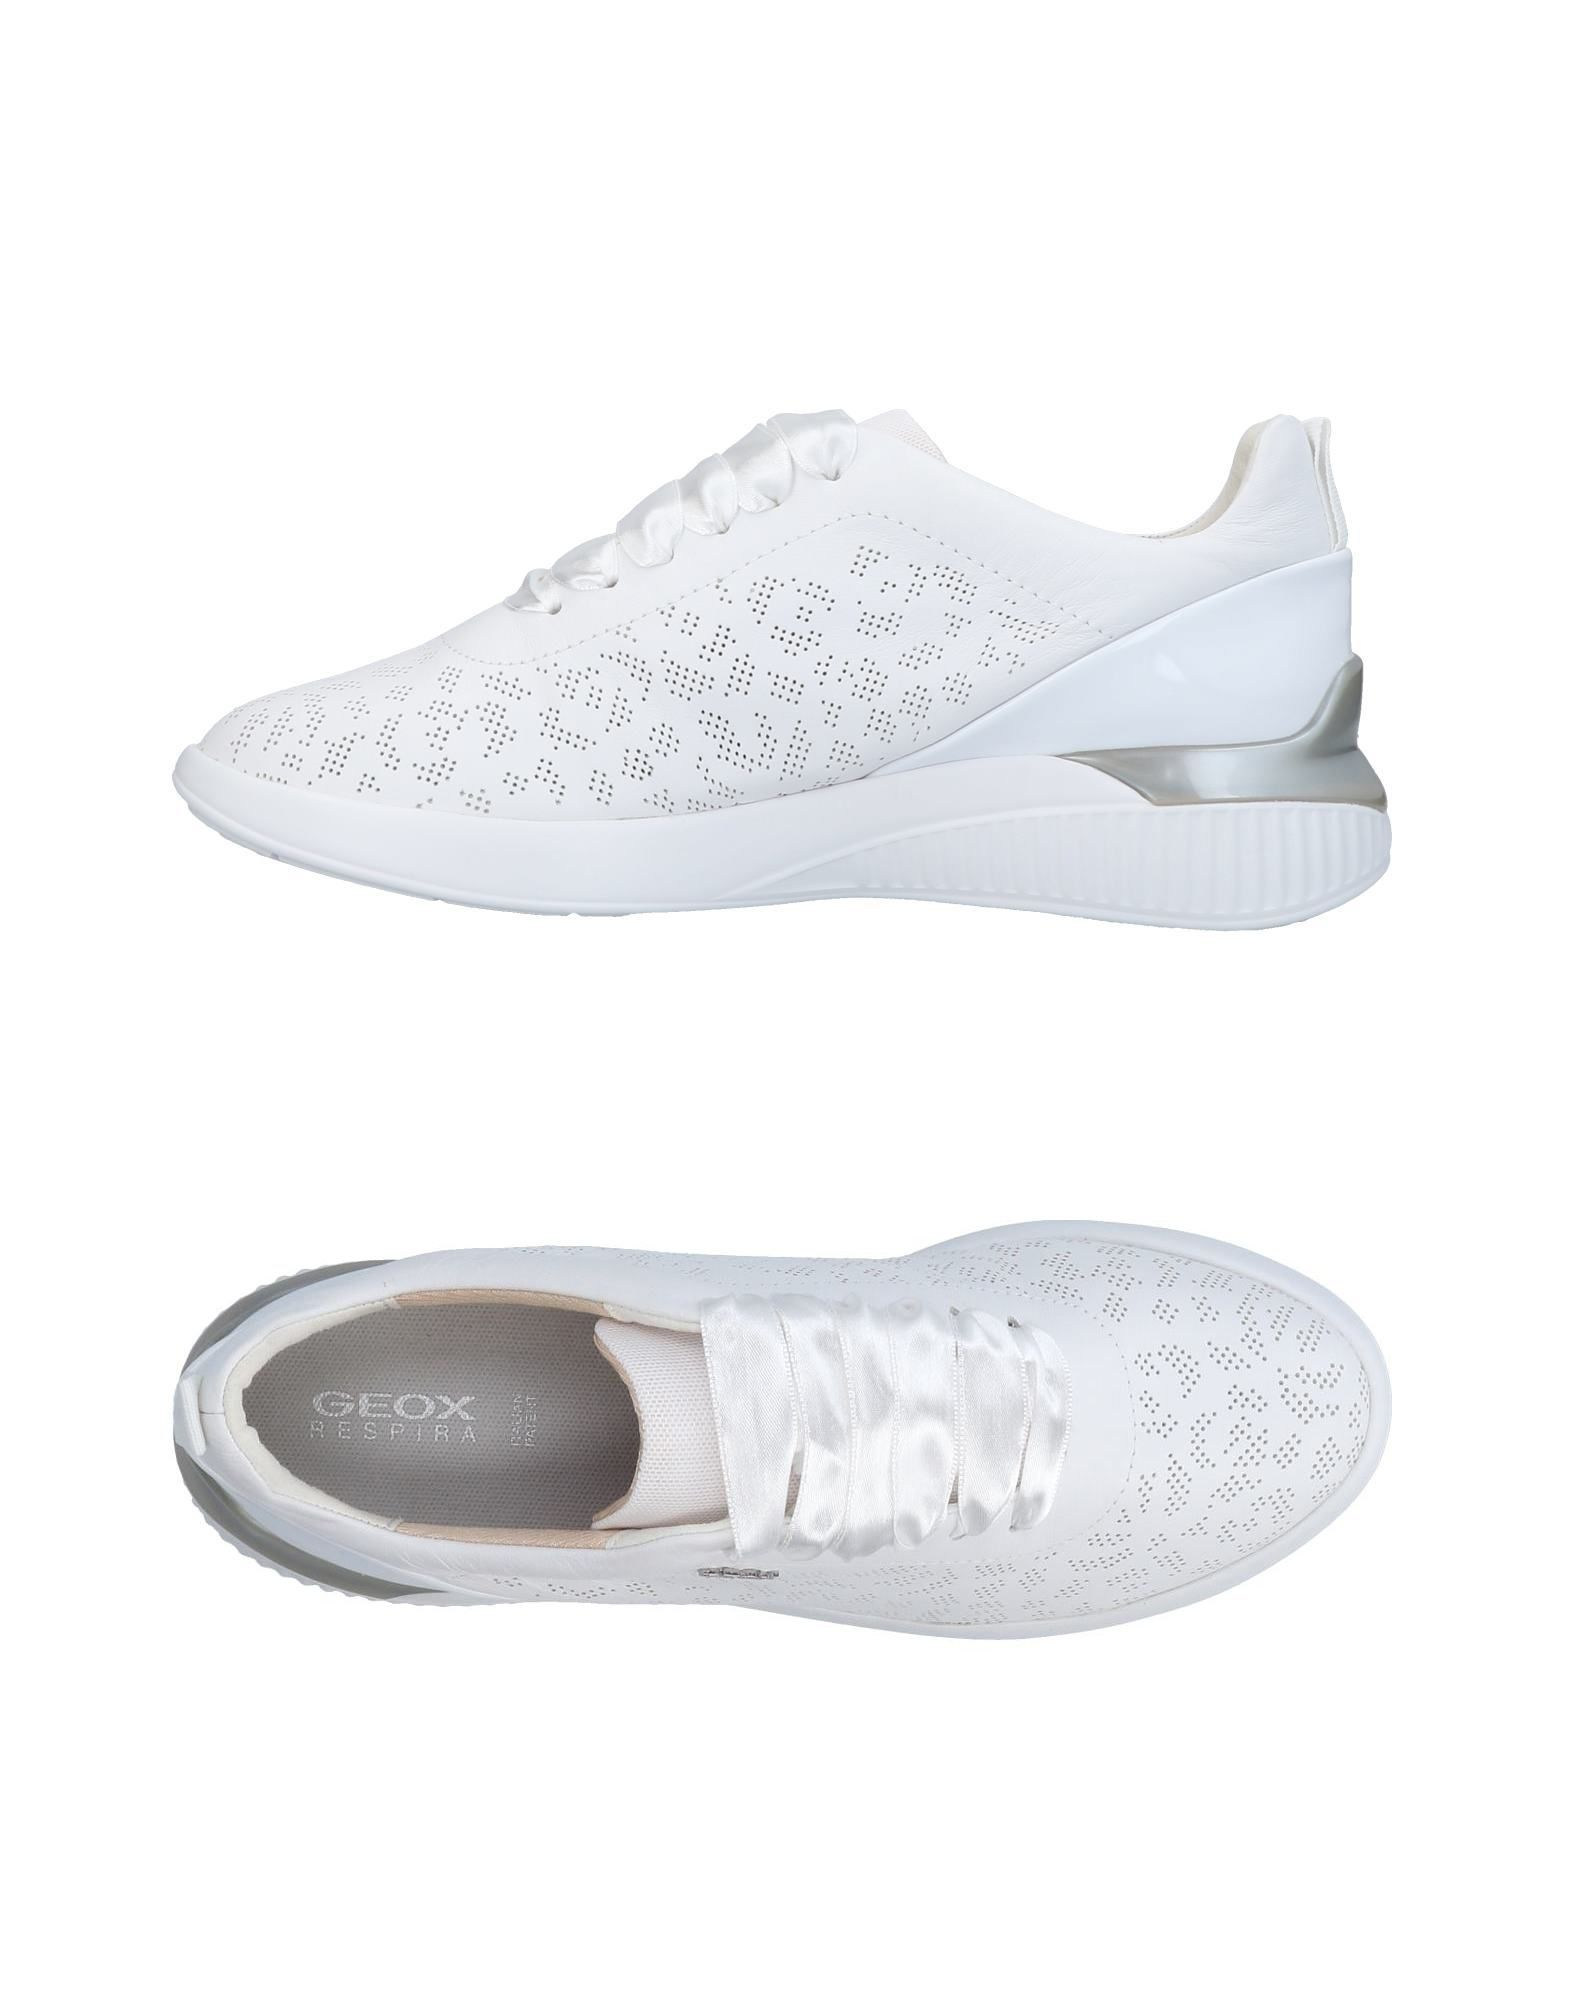 Geox Sneakers Damen  11453364QW Gute Qualität beliebte Schuhe